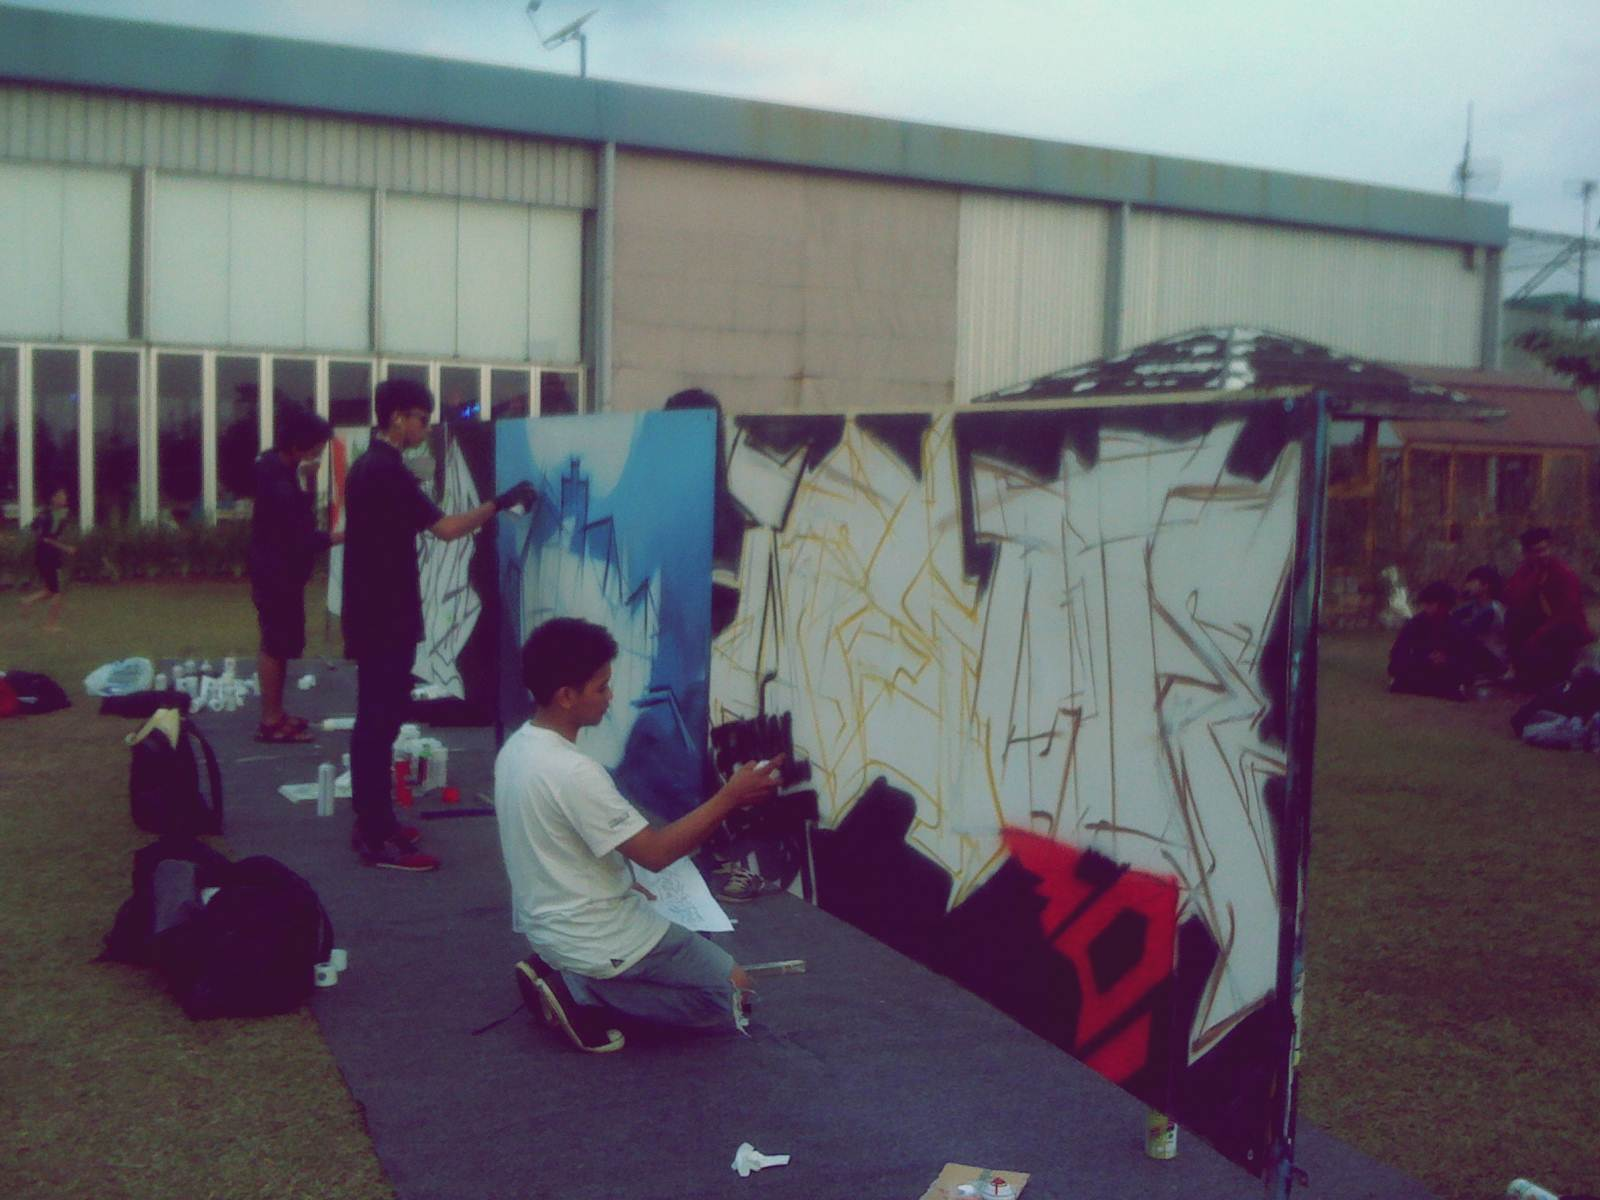 Swapiness final graffiti competition at pvj bandung for Mural untuk kanak kanak